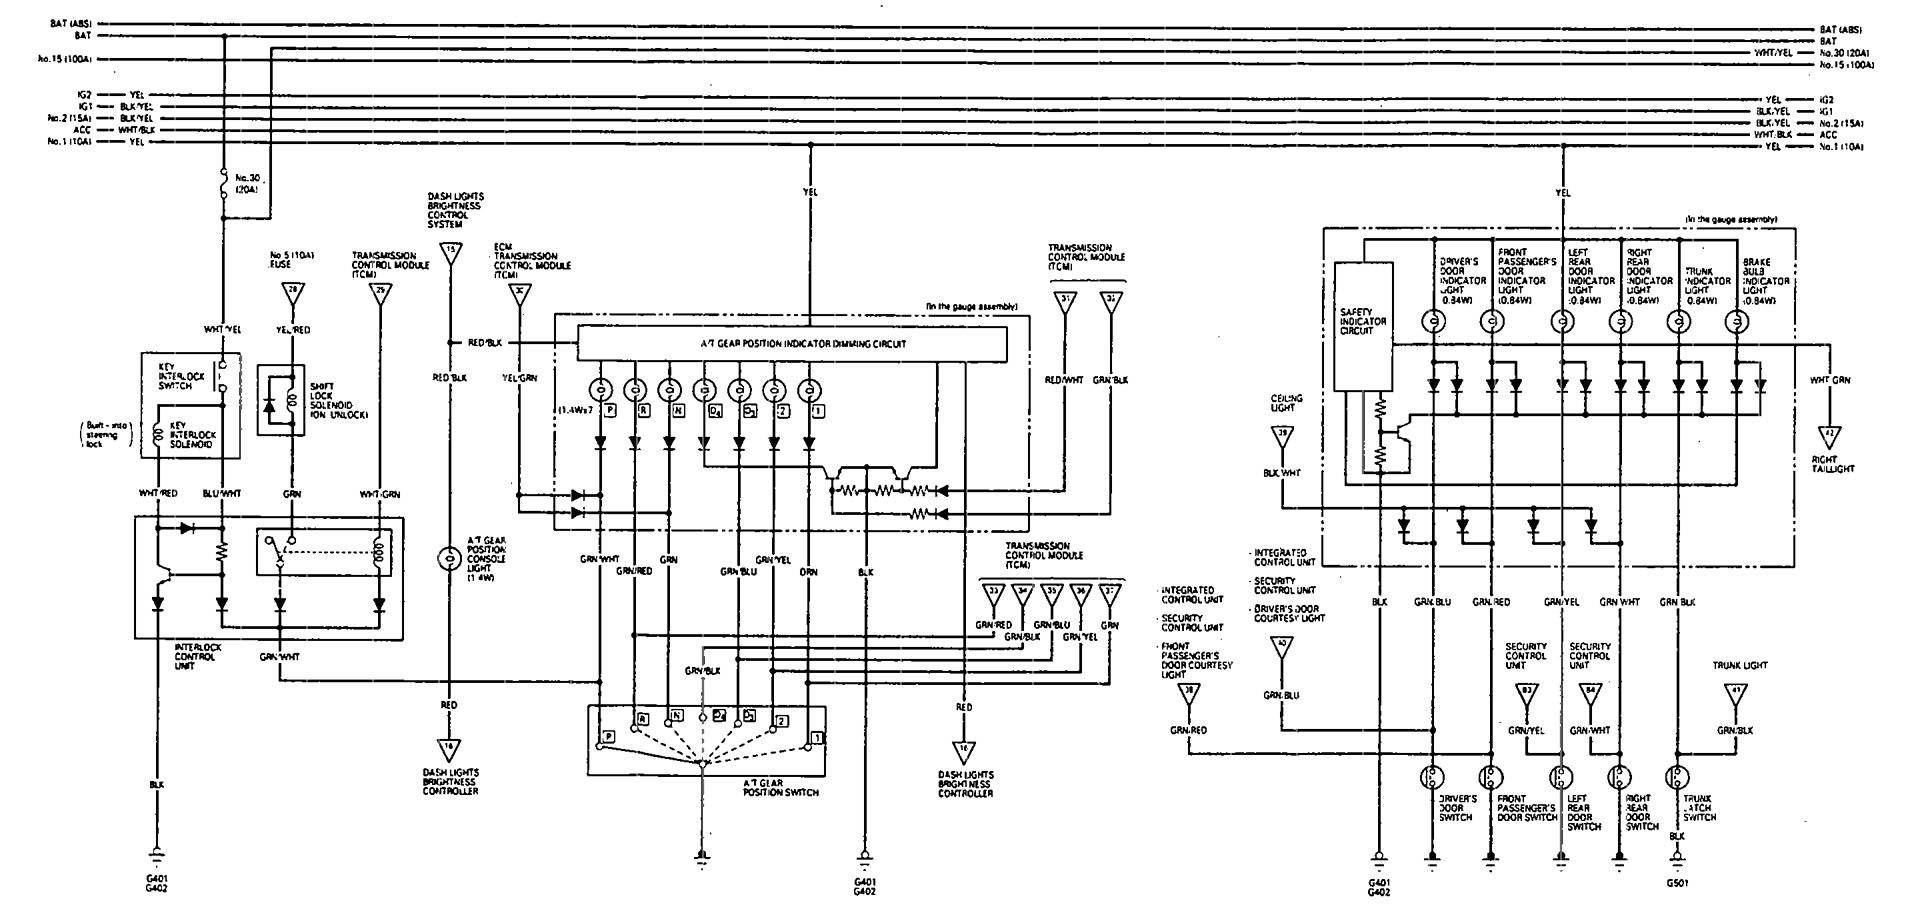 Acura Vigor (1993) - wiring diagrams - shift indicator - Carknowledge.info | Acura Vigor Wiring Diagram |  | Carknowledge.info